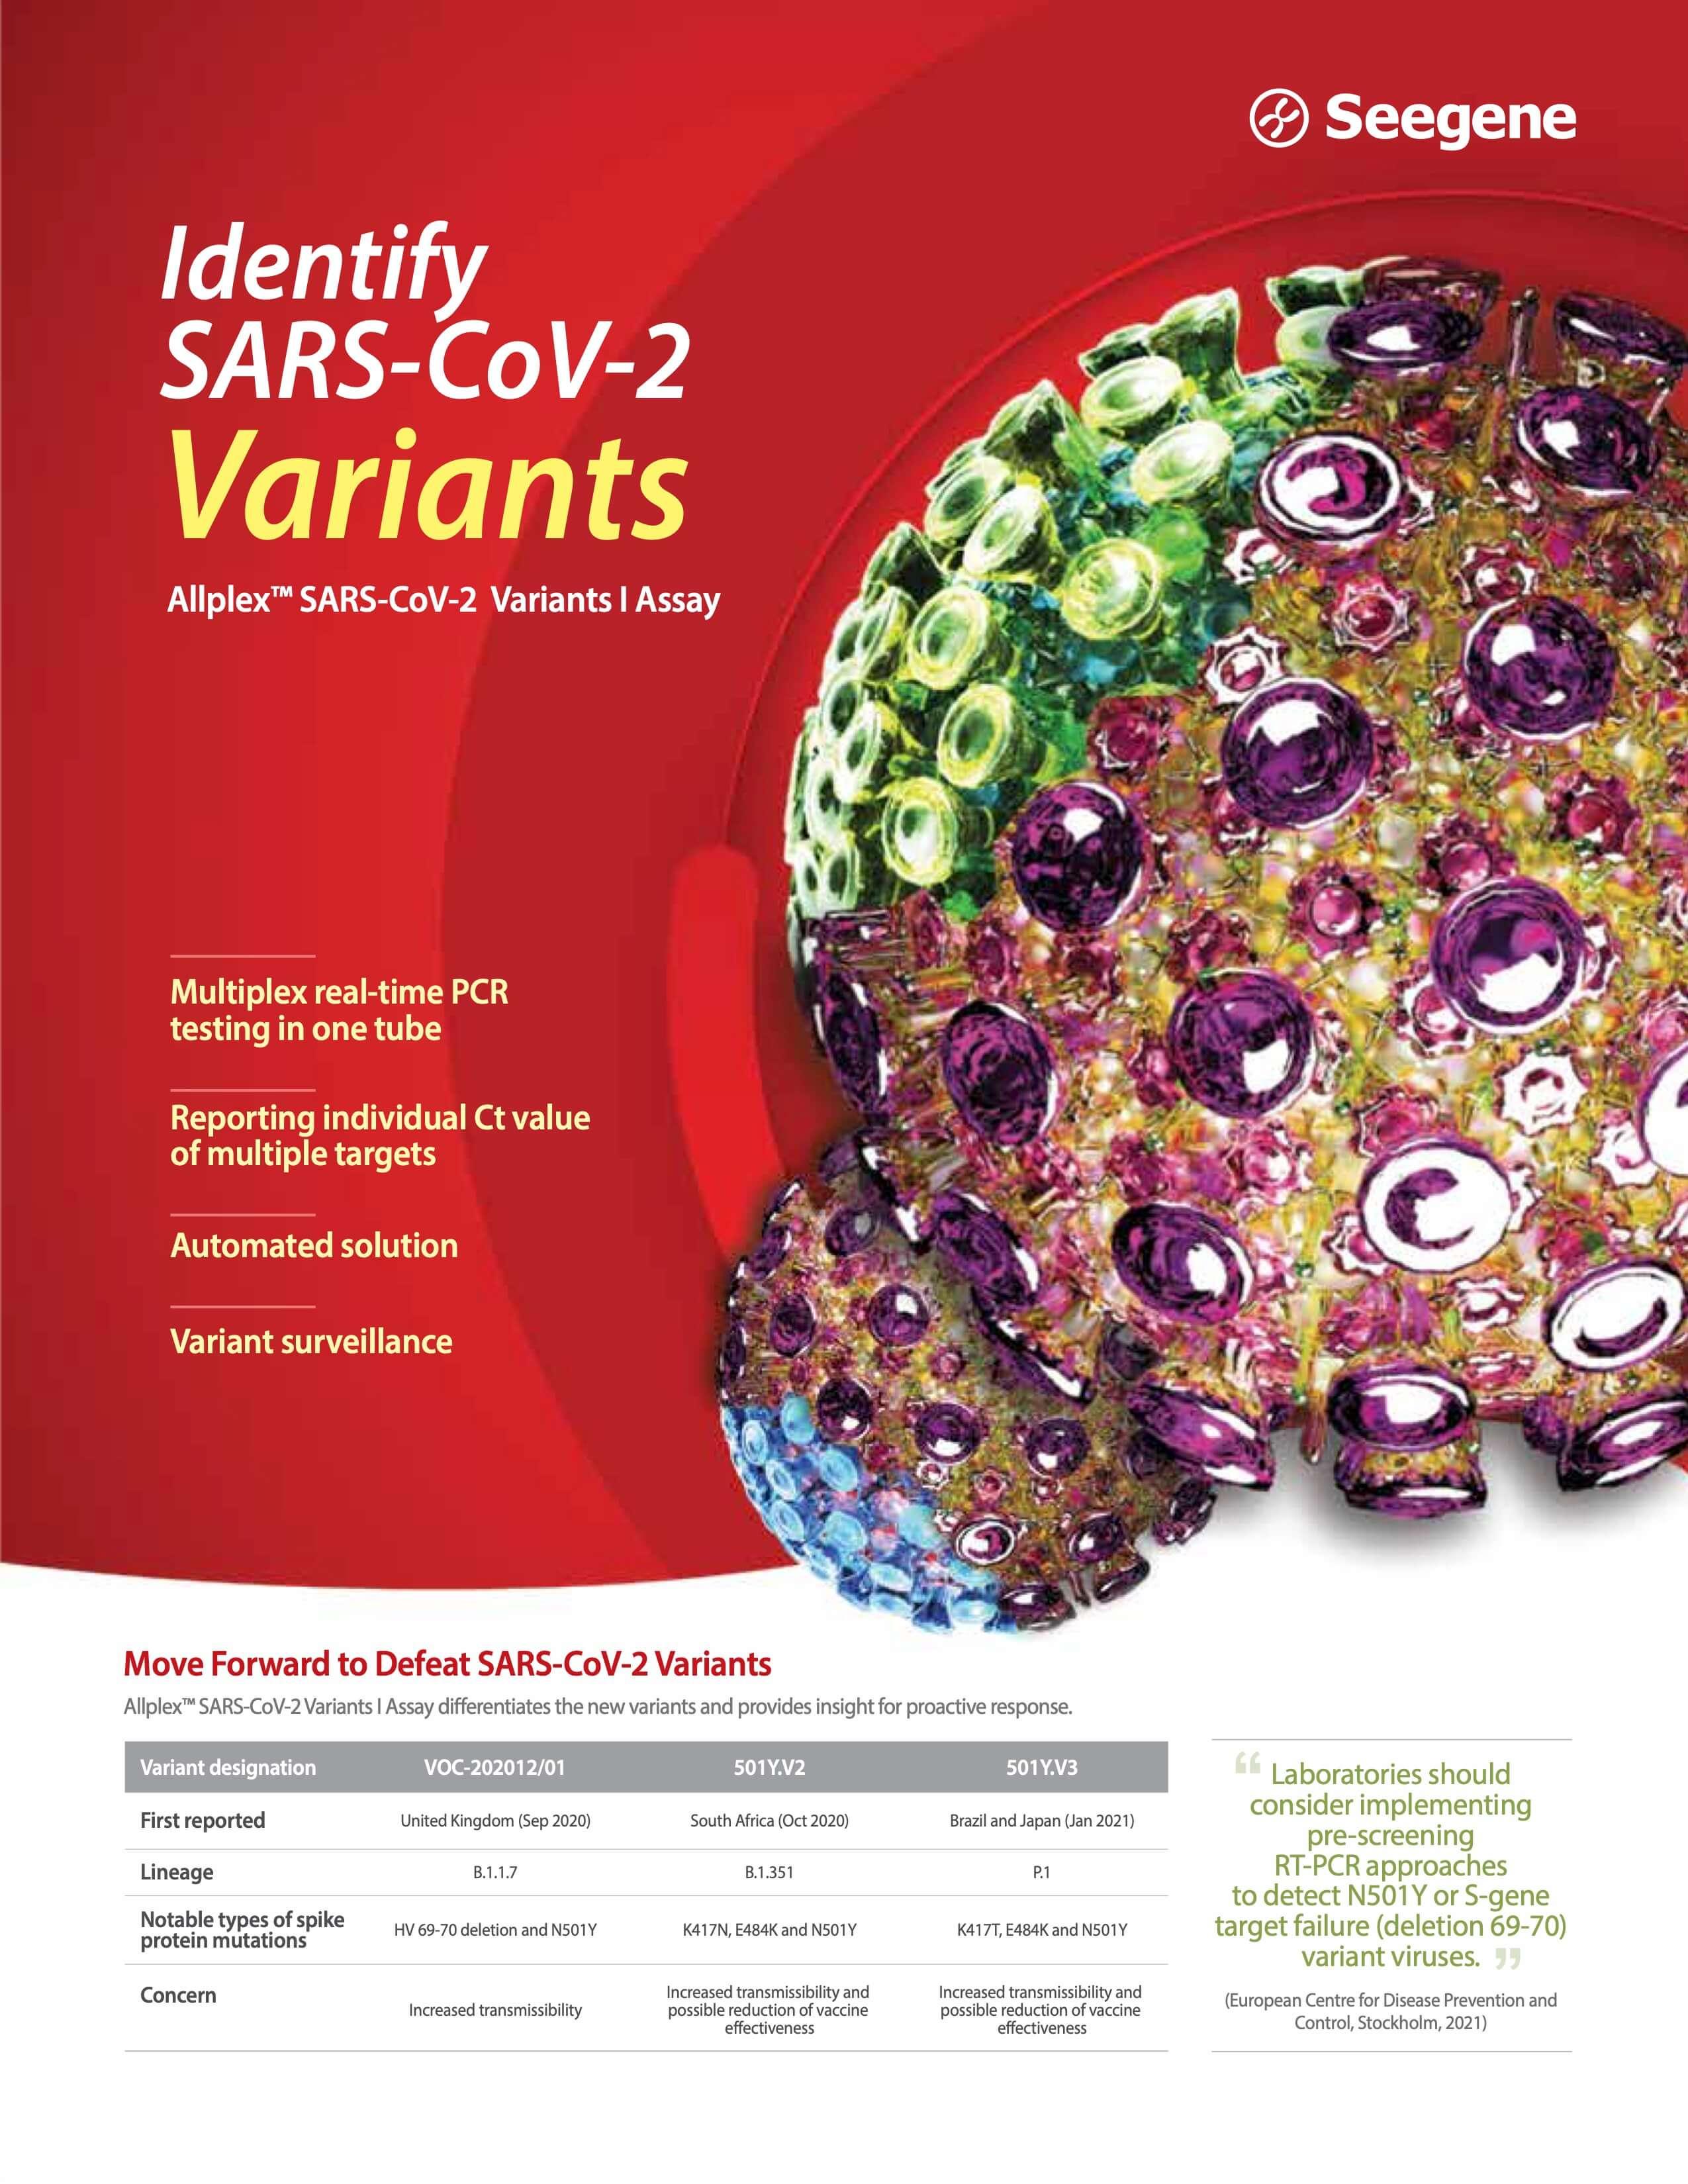 Identify SARS-CoV-2 Variants